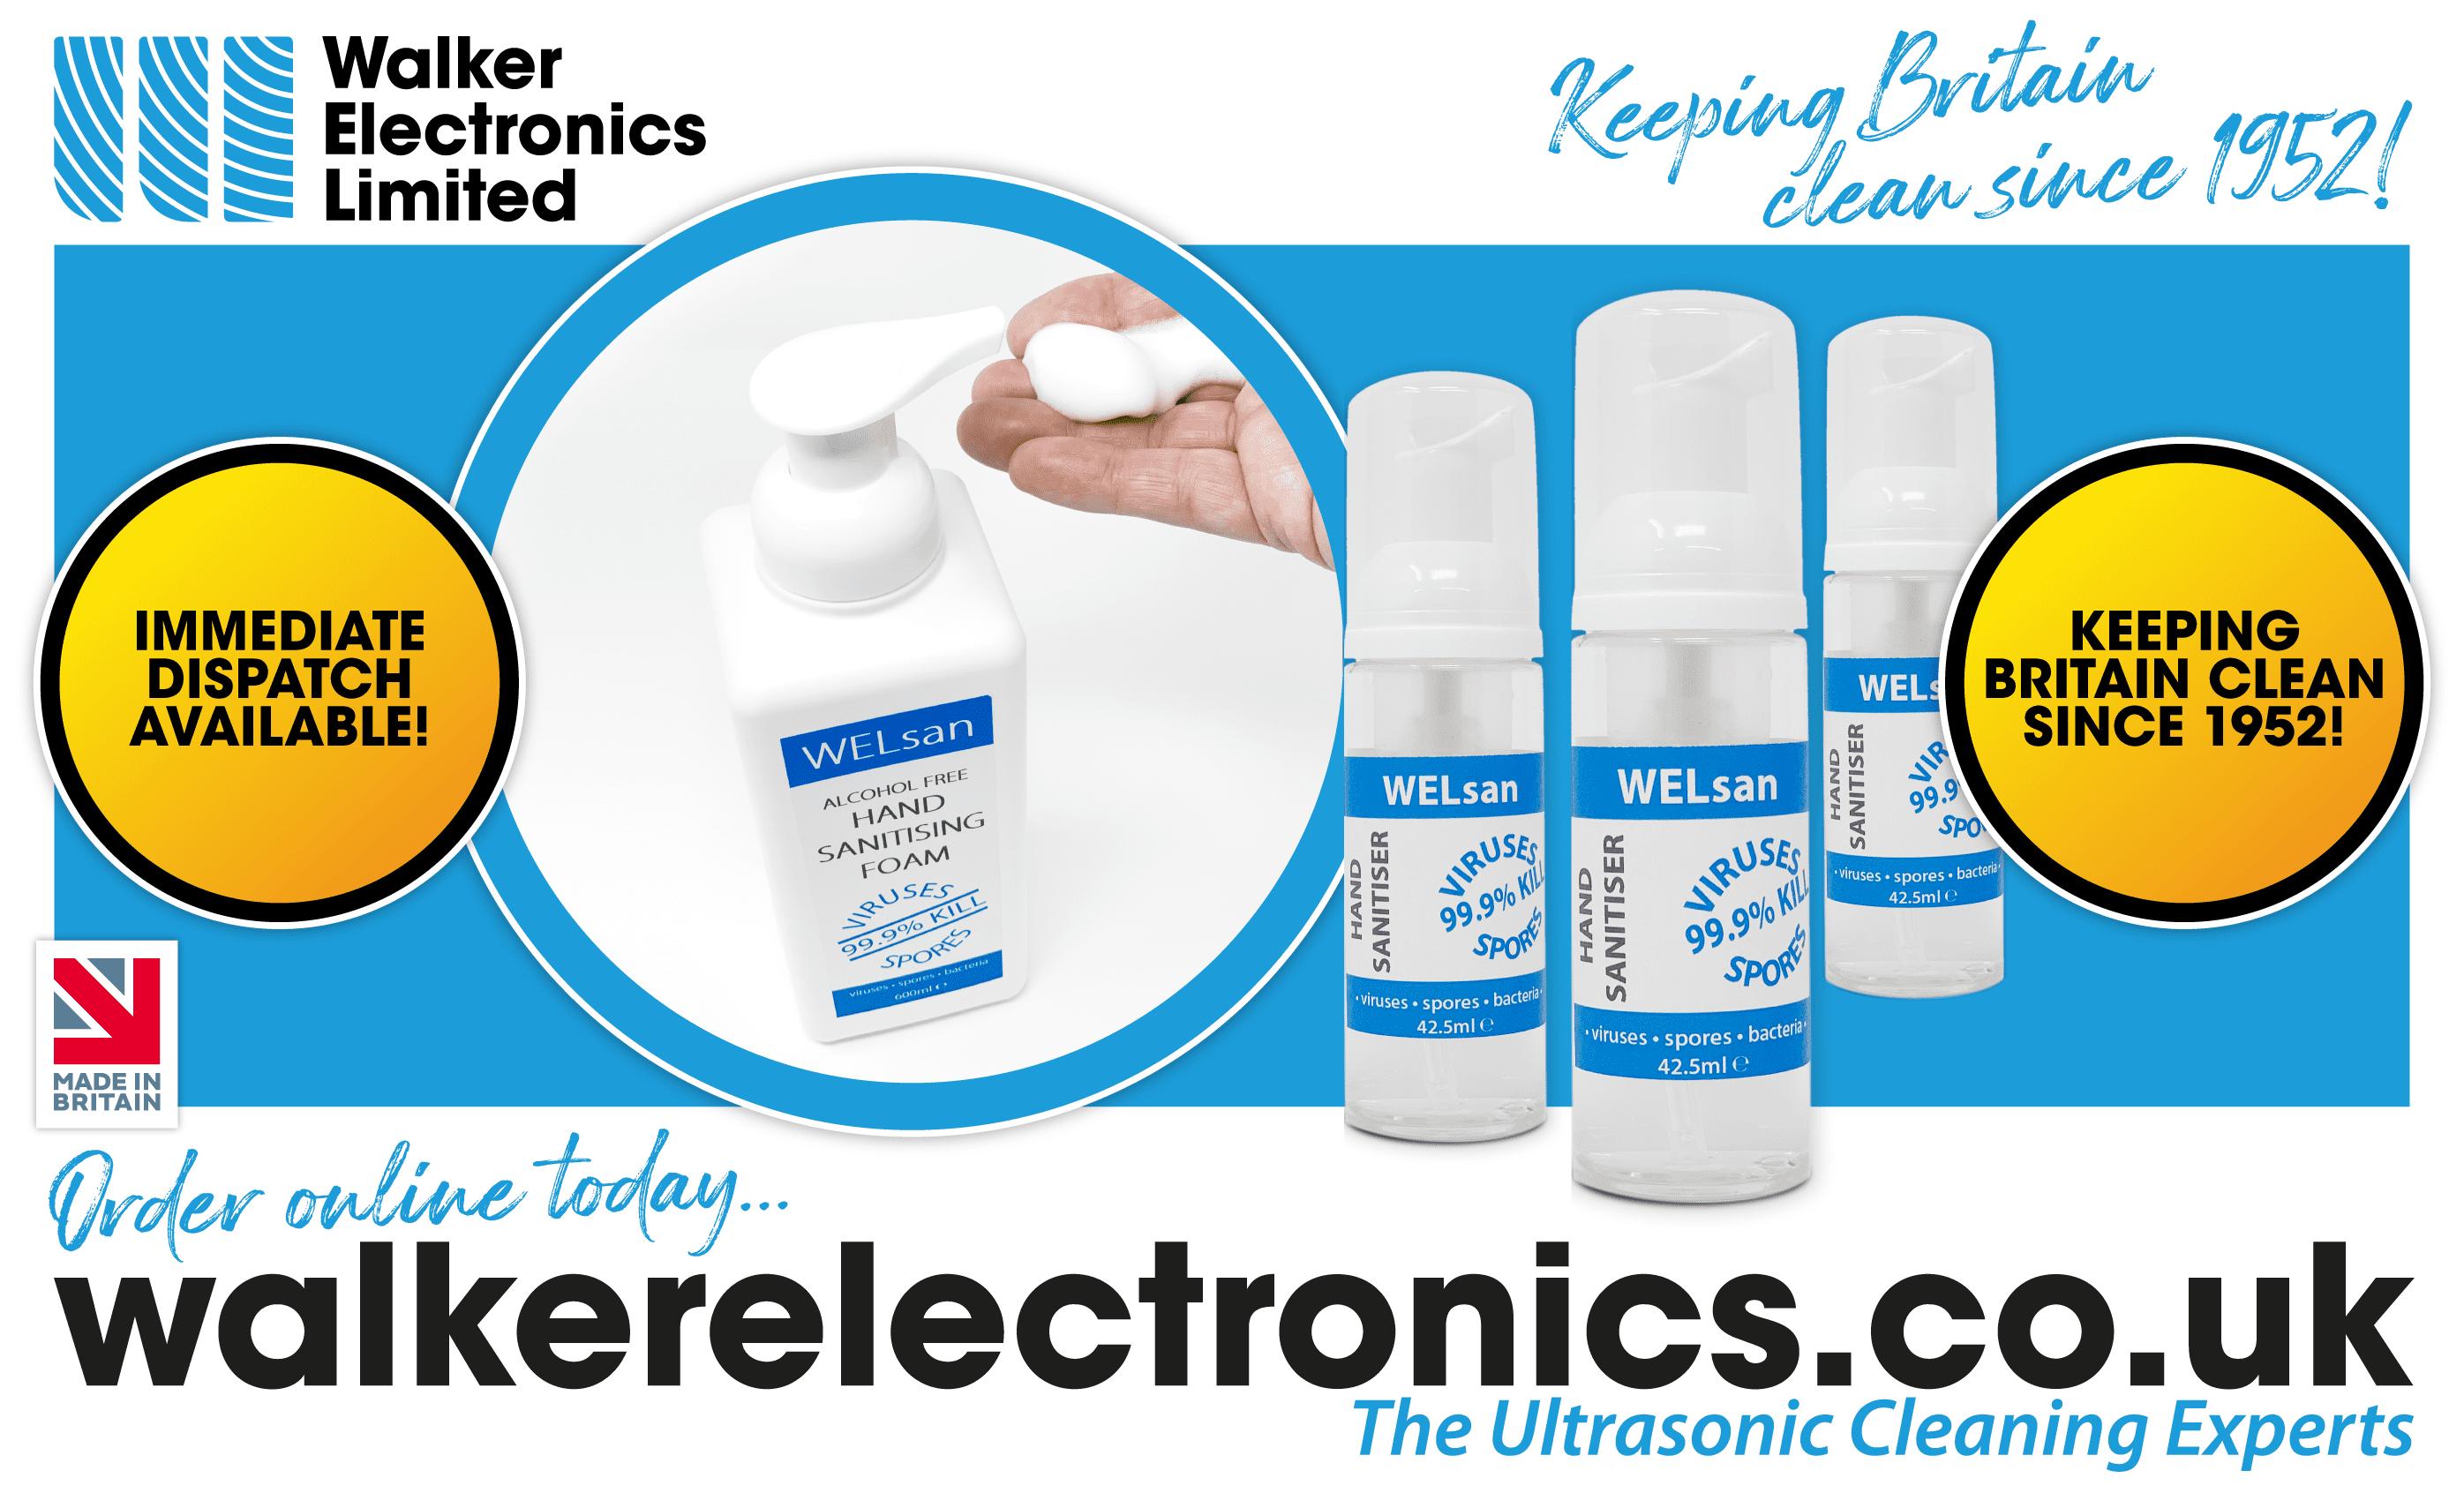 WELSan Hand Sanitiser from Walker Electronics Ltd